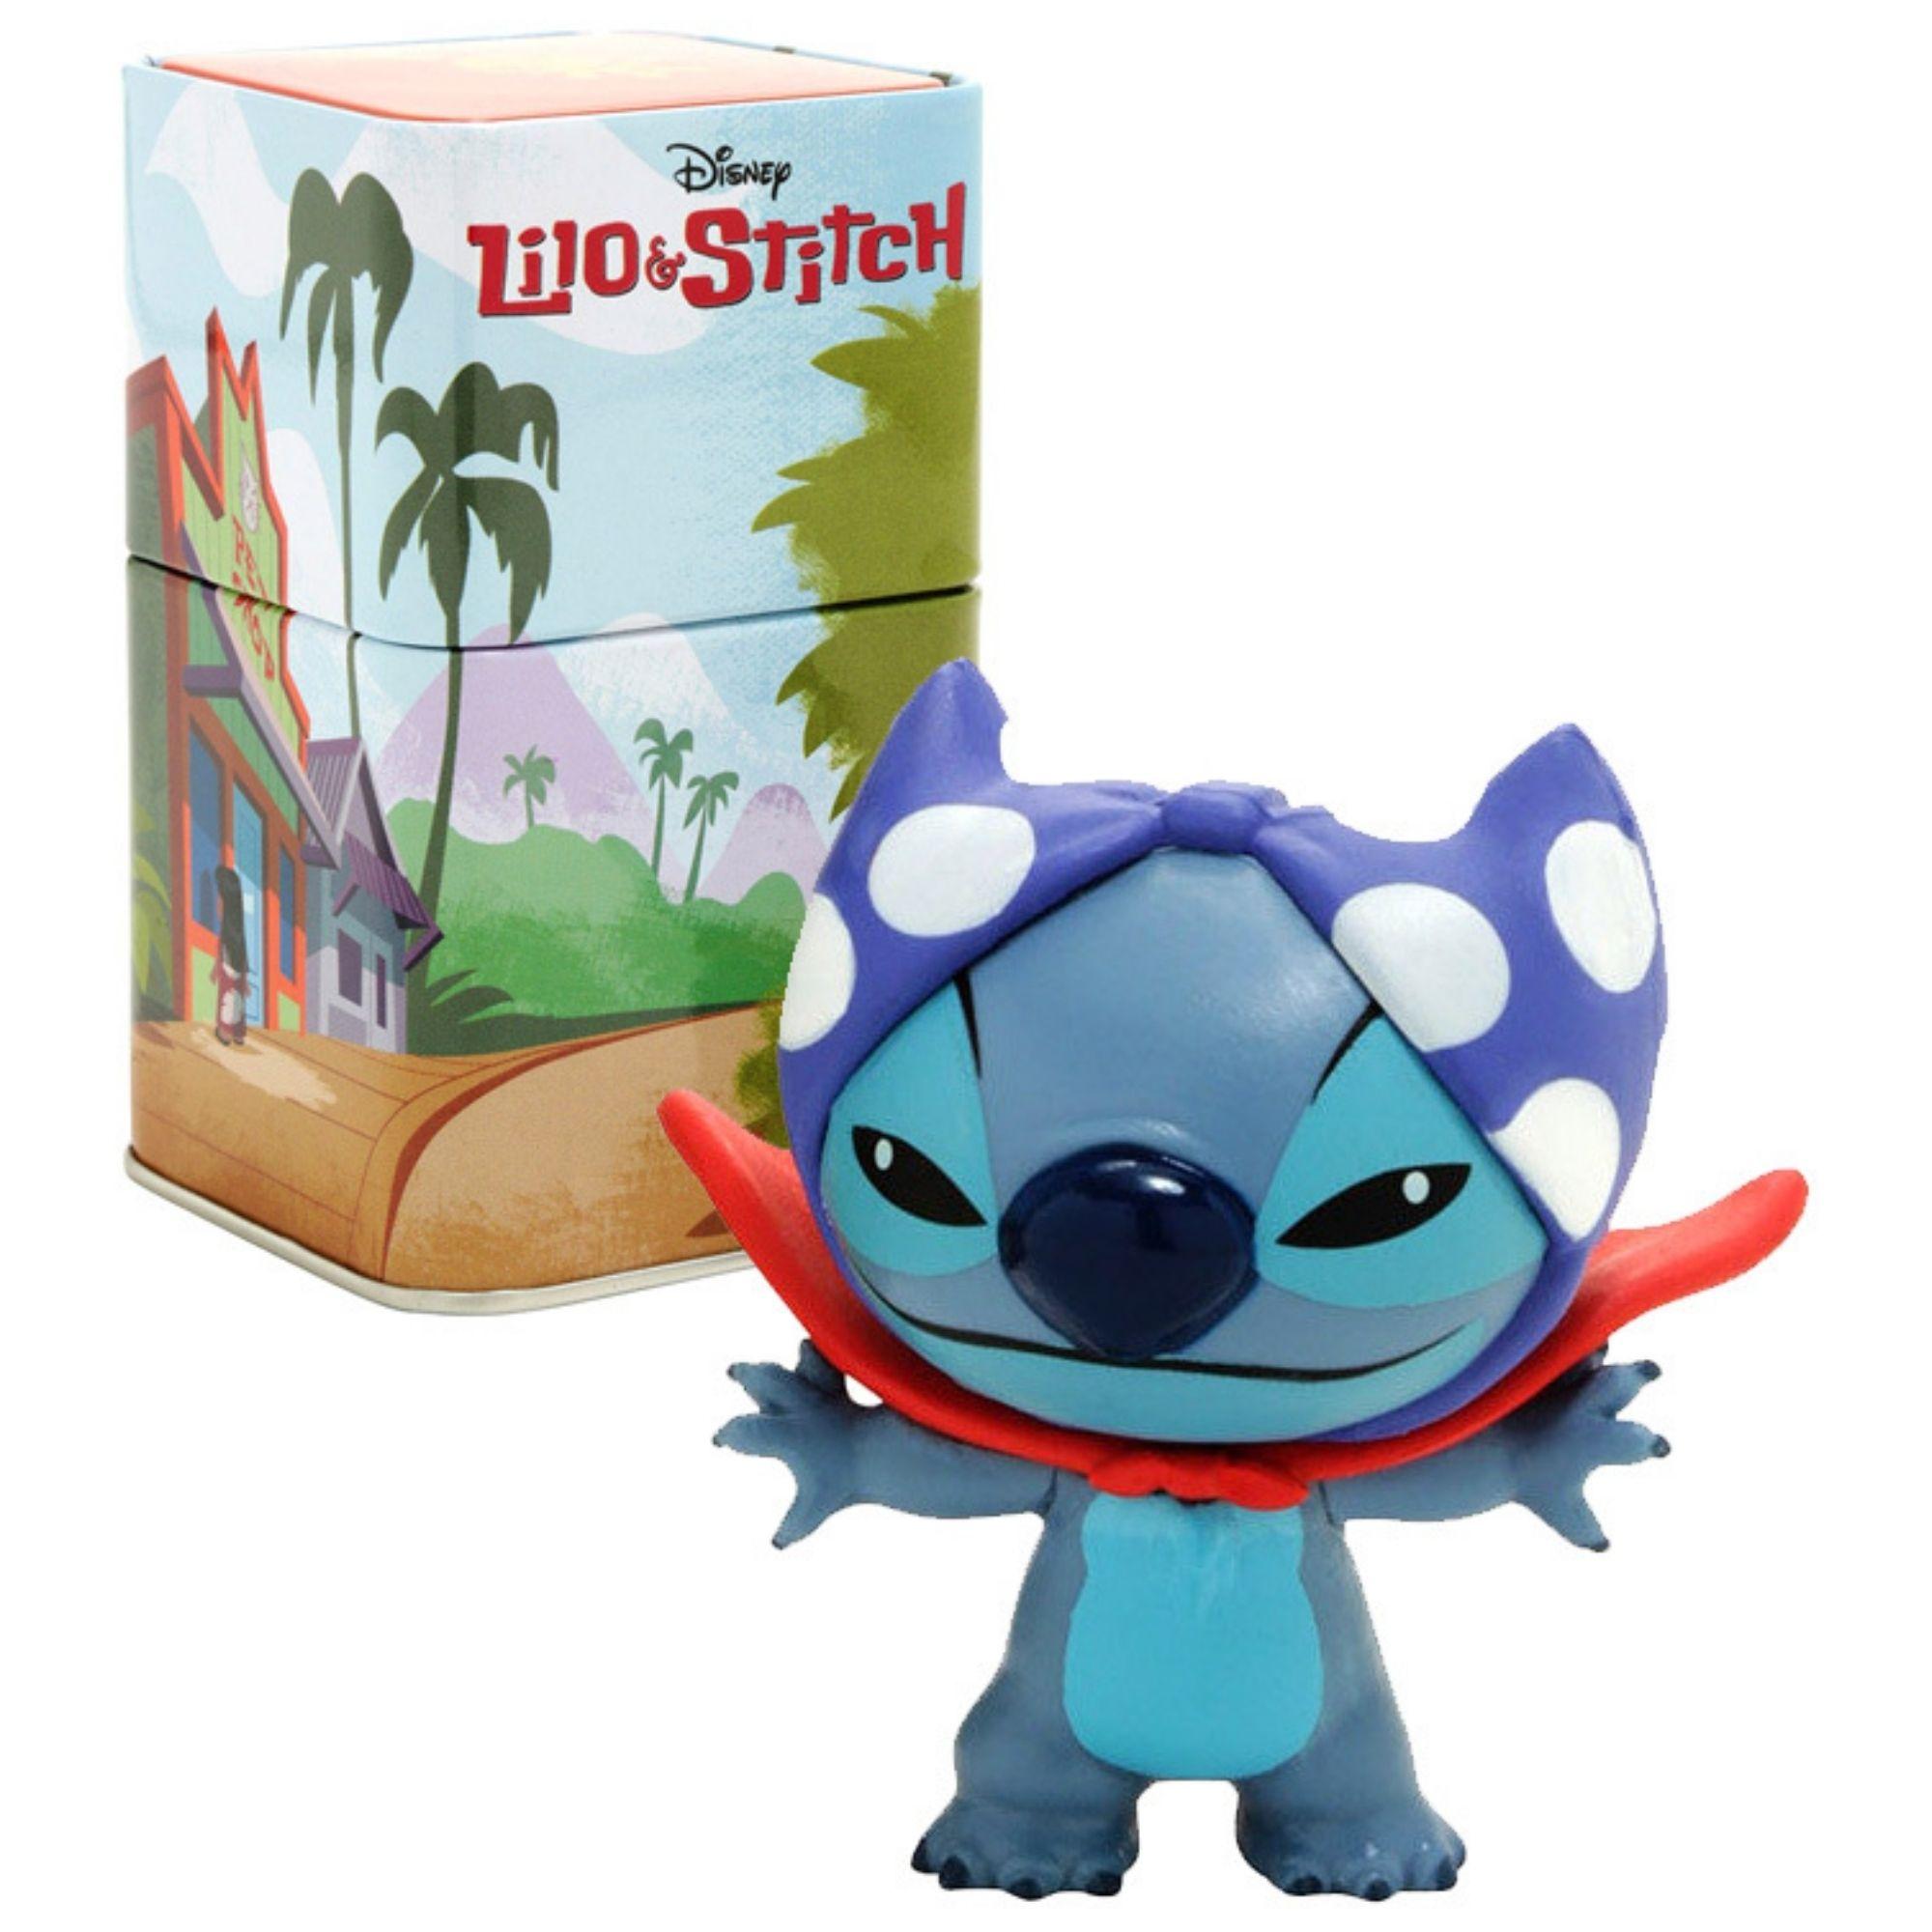 Caixa Funko Disney Lilo & Stitch Treasure Hot Topic Aloha Pineapple  - Game Land Brinquedos